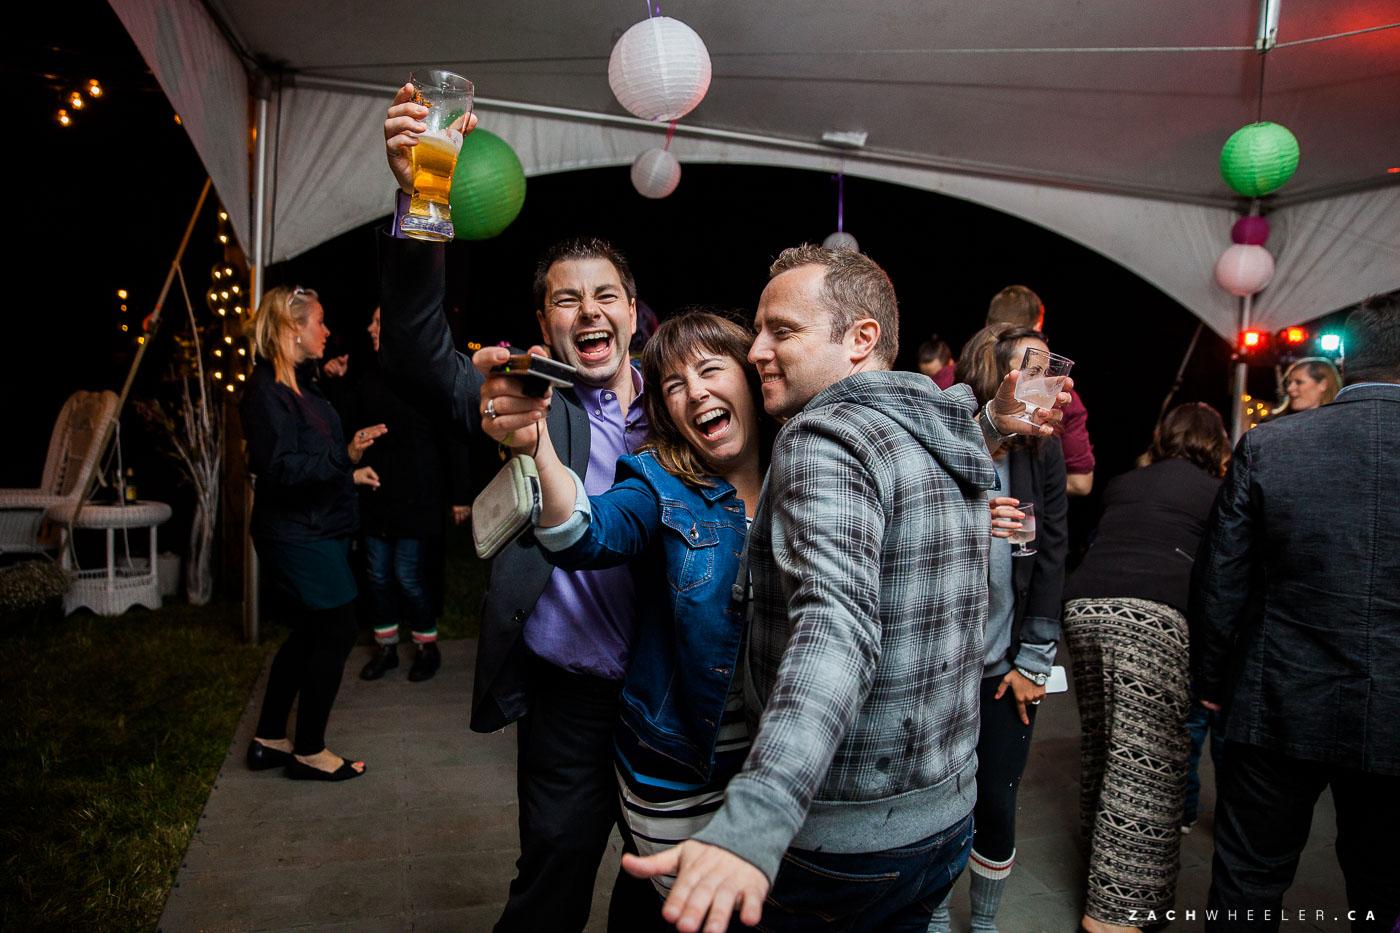 StJohns-Newfoundland-Backyard-Wedding-42